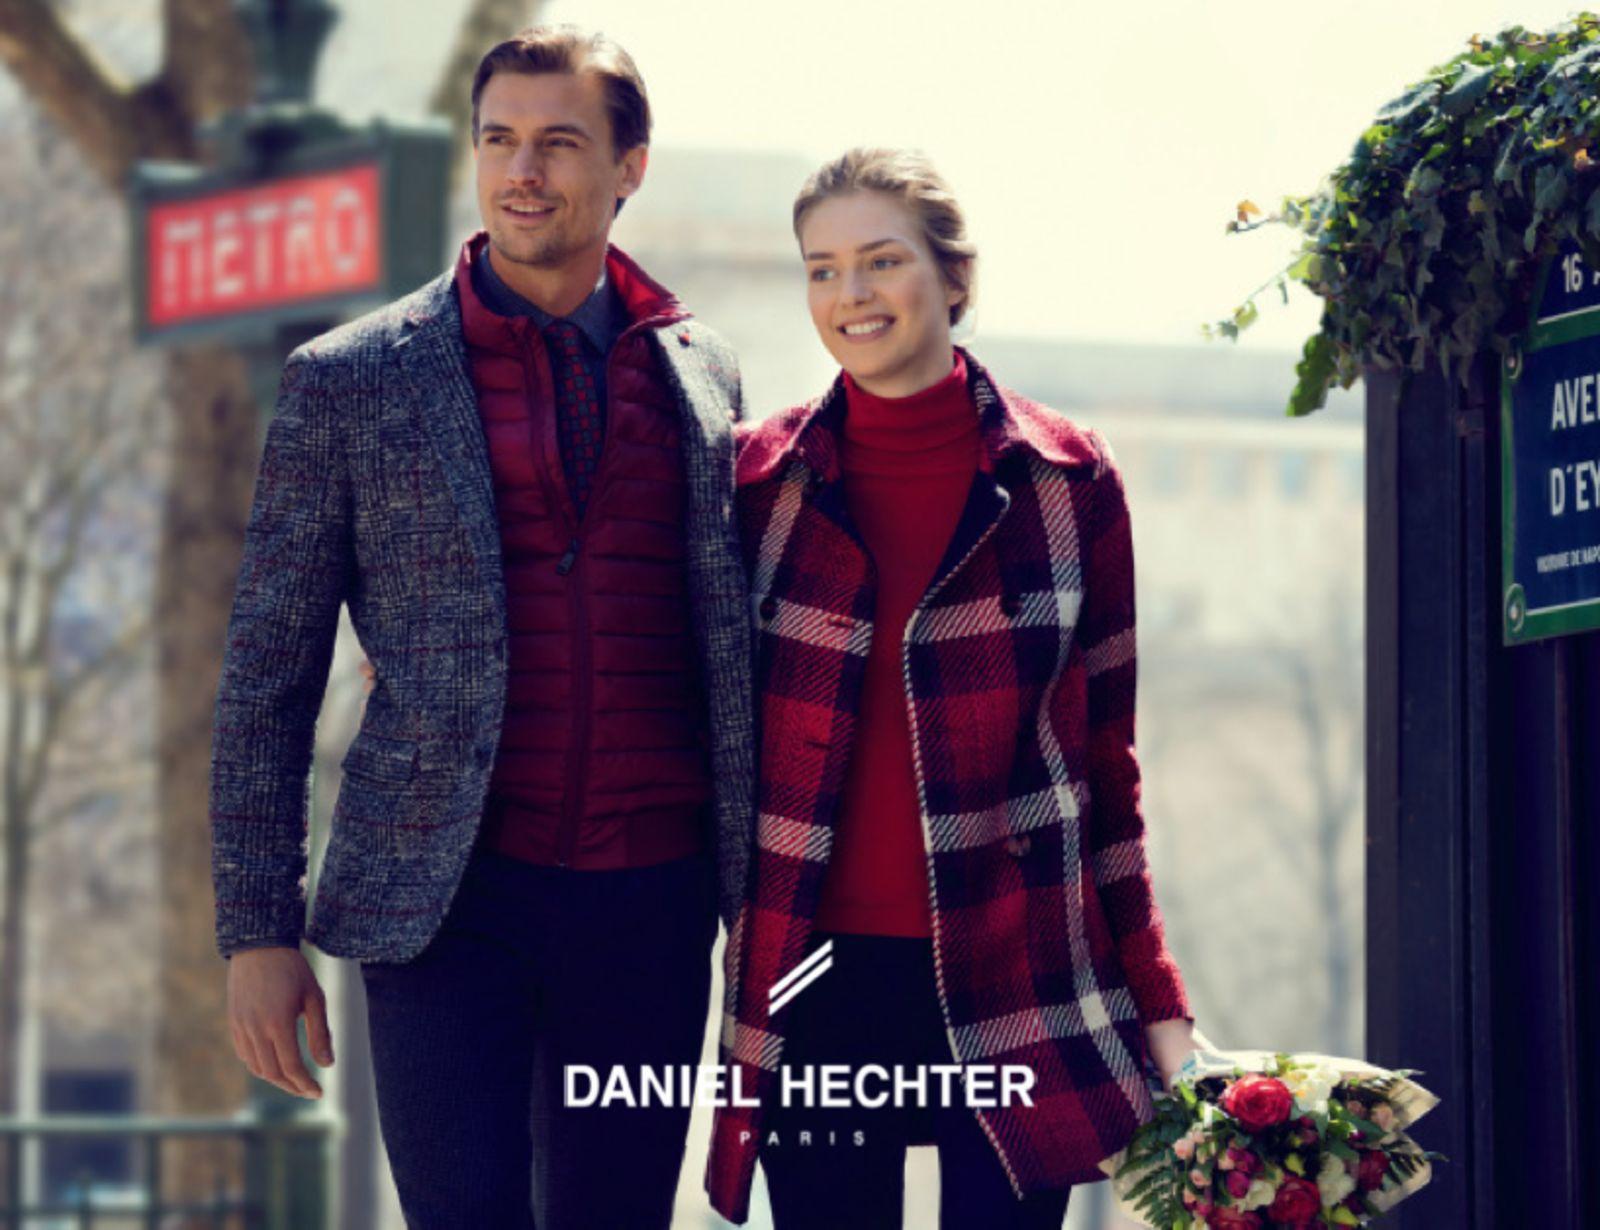 DANIEL HECHTER (Bild 2)